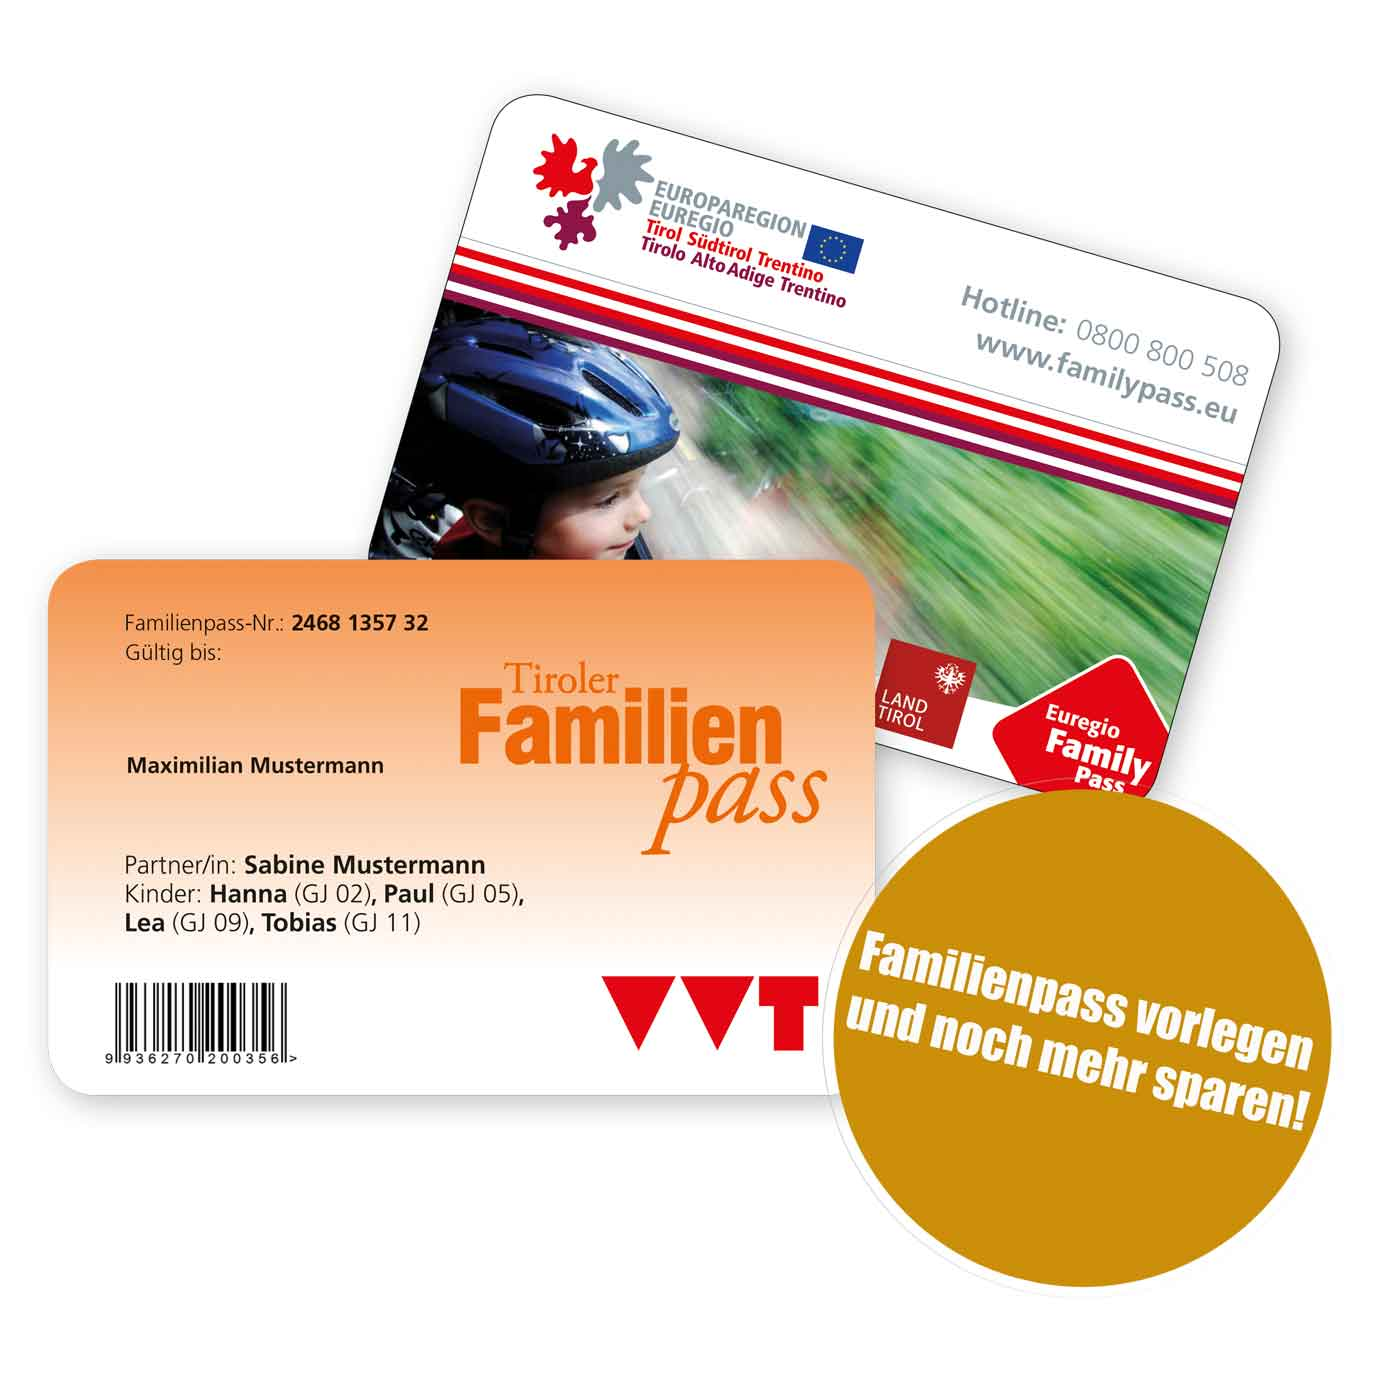 Familienpass_skikoenig-kappl